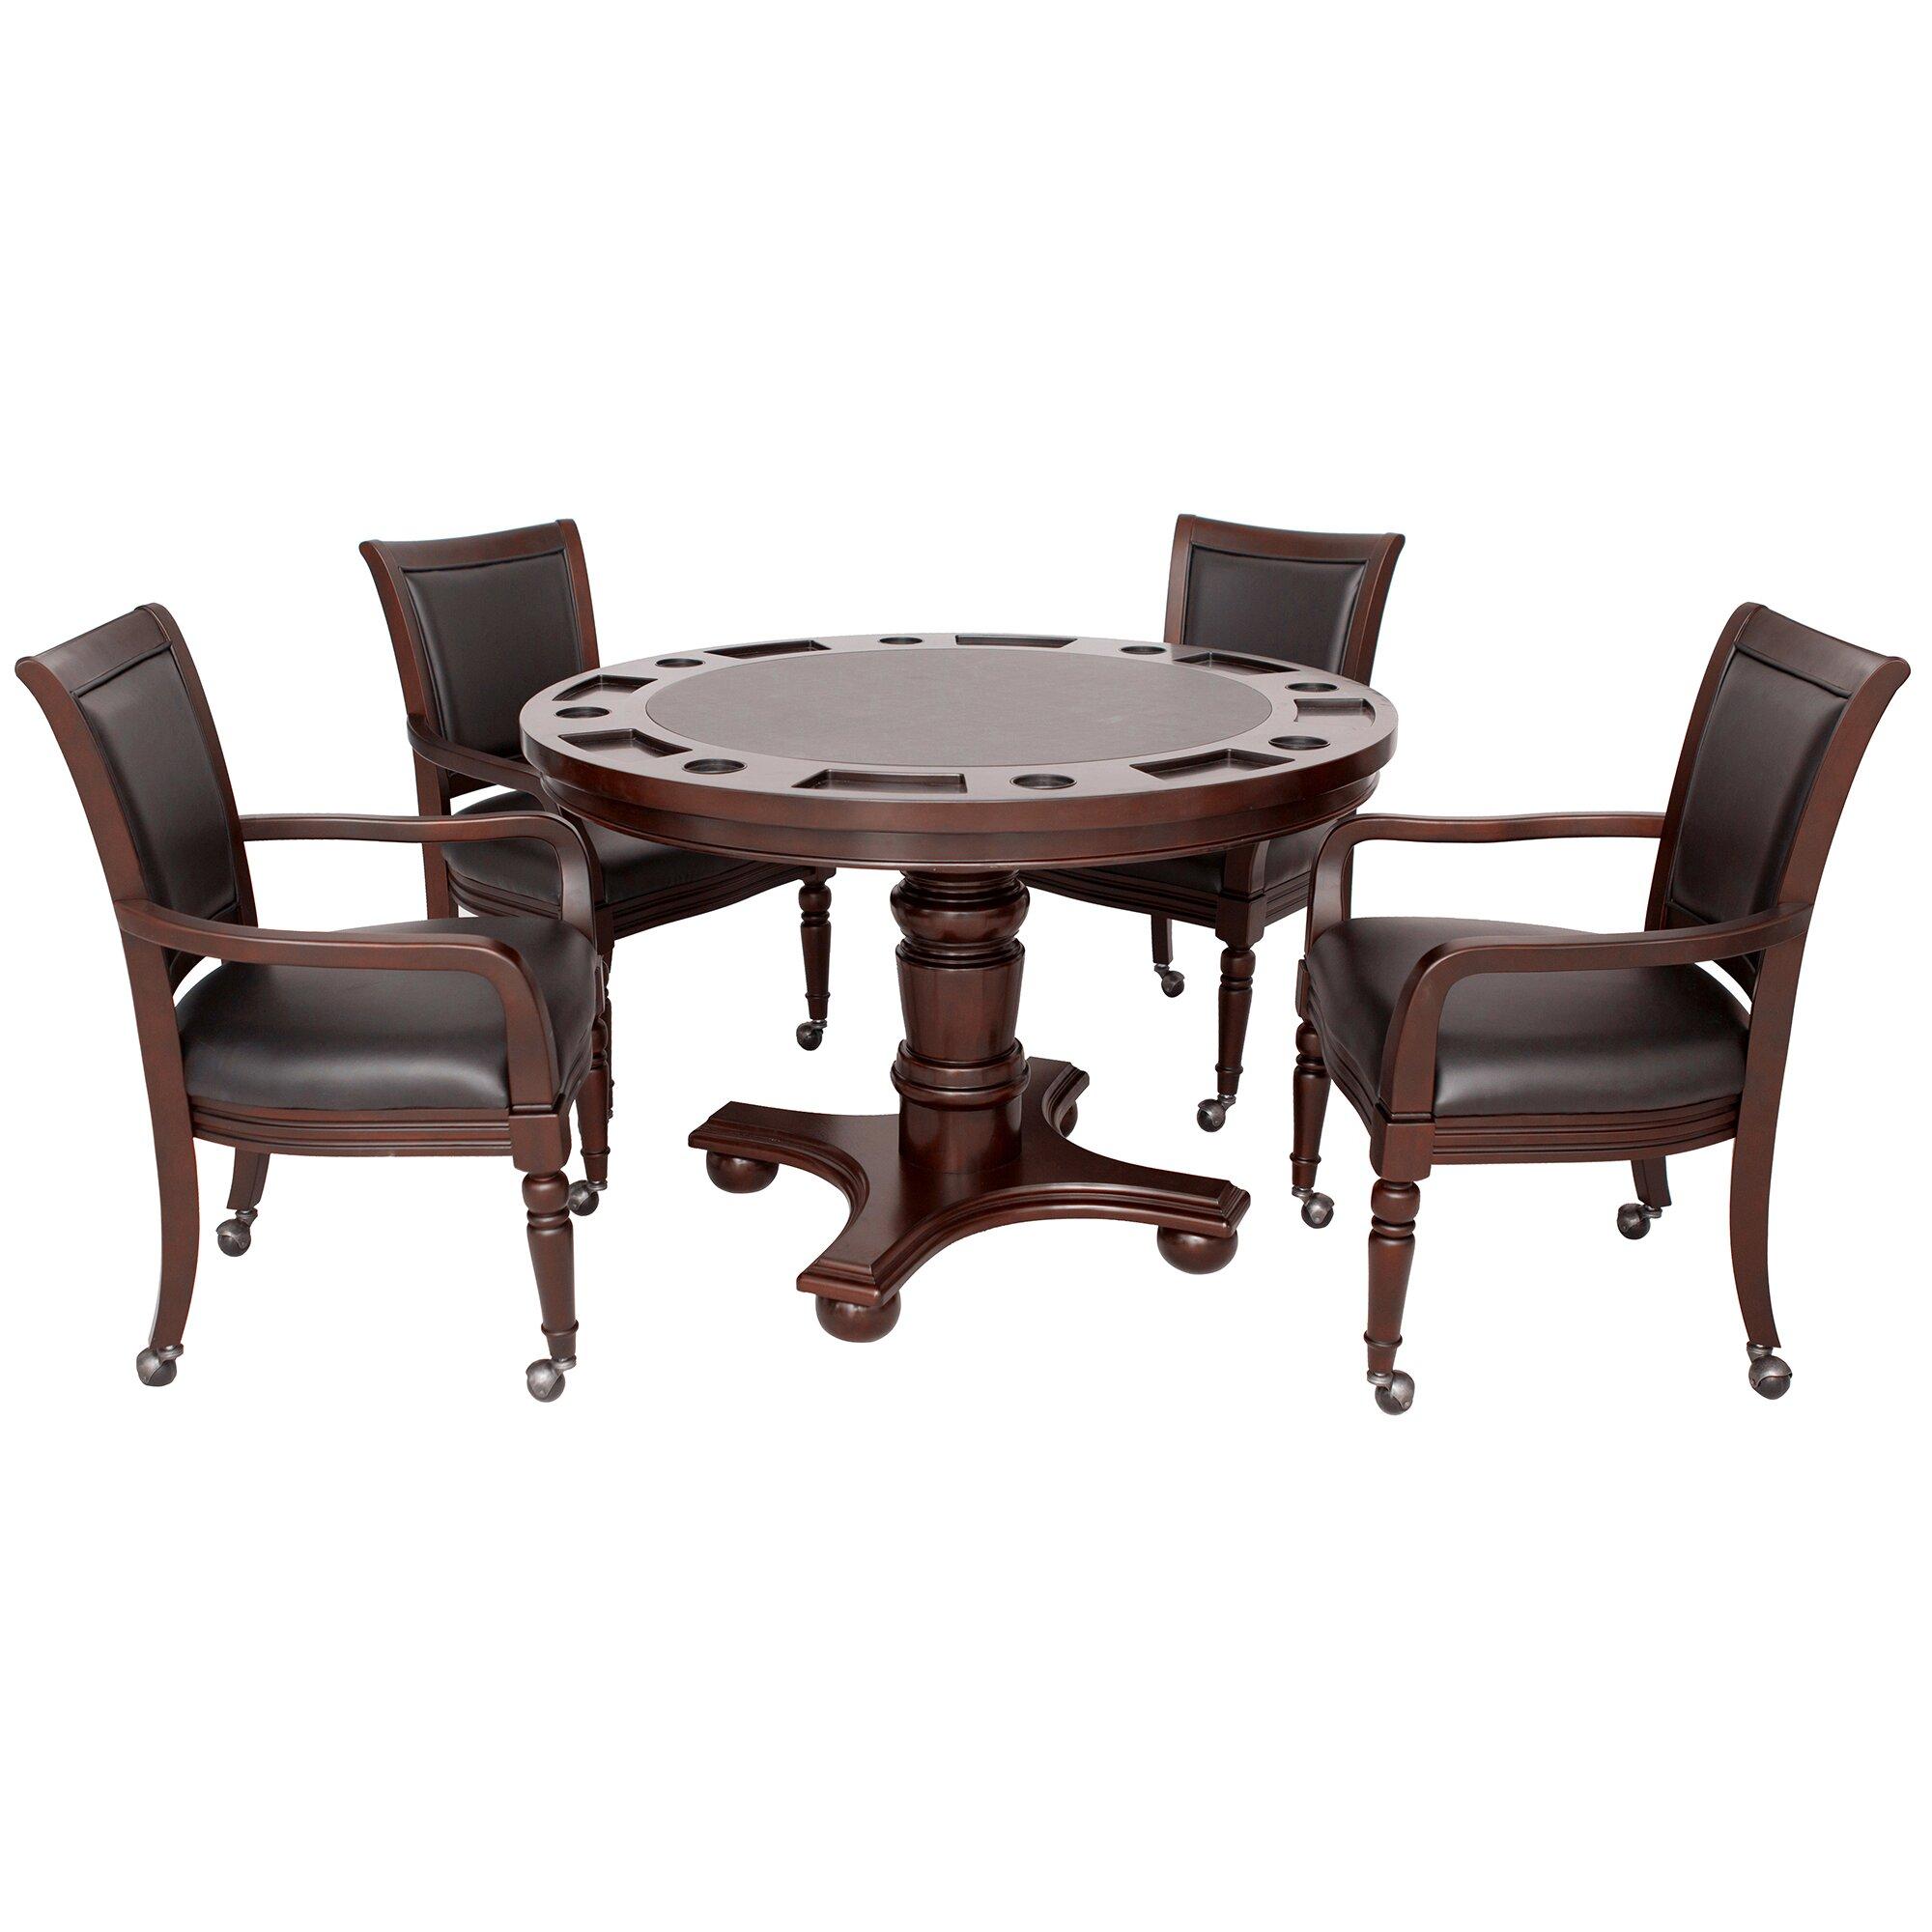 Hathaway Games Bridgeport 2-in-1 Poker Game Table Set & Reviews ...